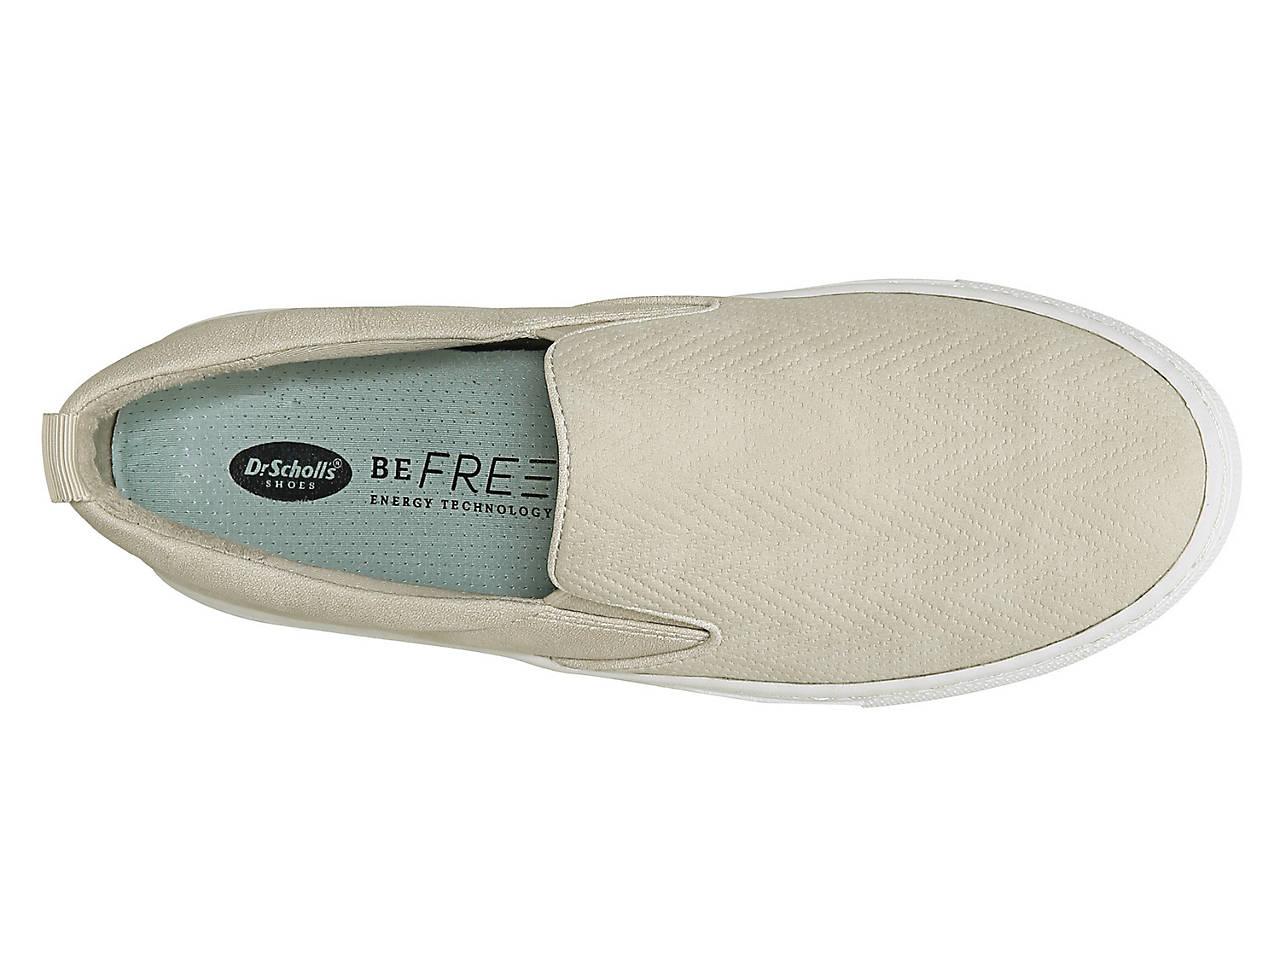 80e53414f27 Dr. Scholl s No Bad Days Platform Slip-On Sneaker Women s Shoes